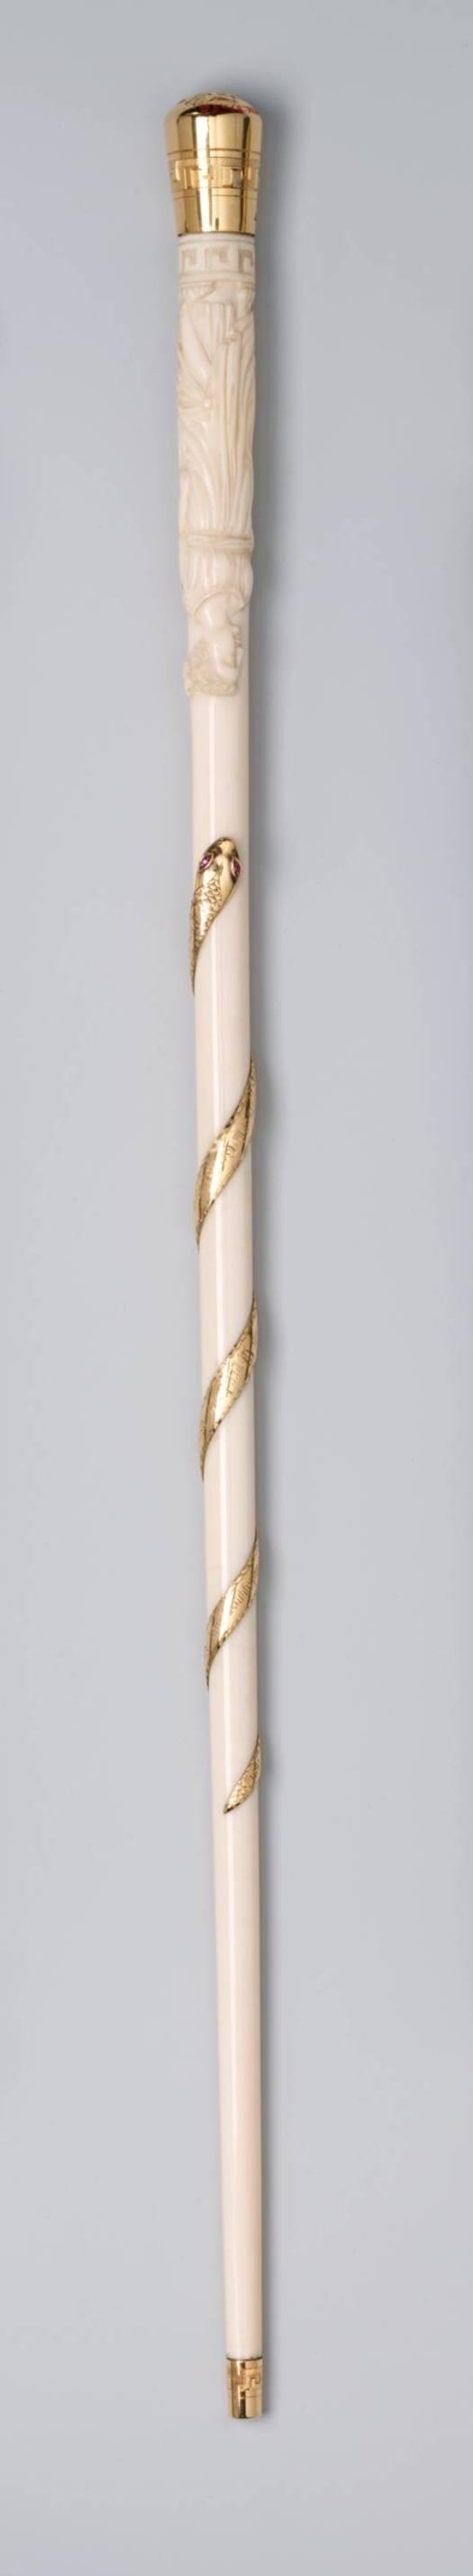 Conductor's baton history